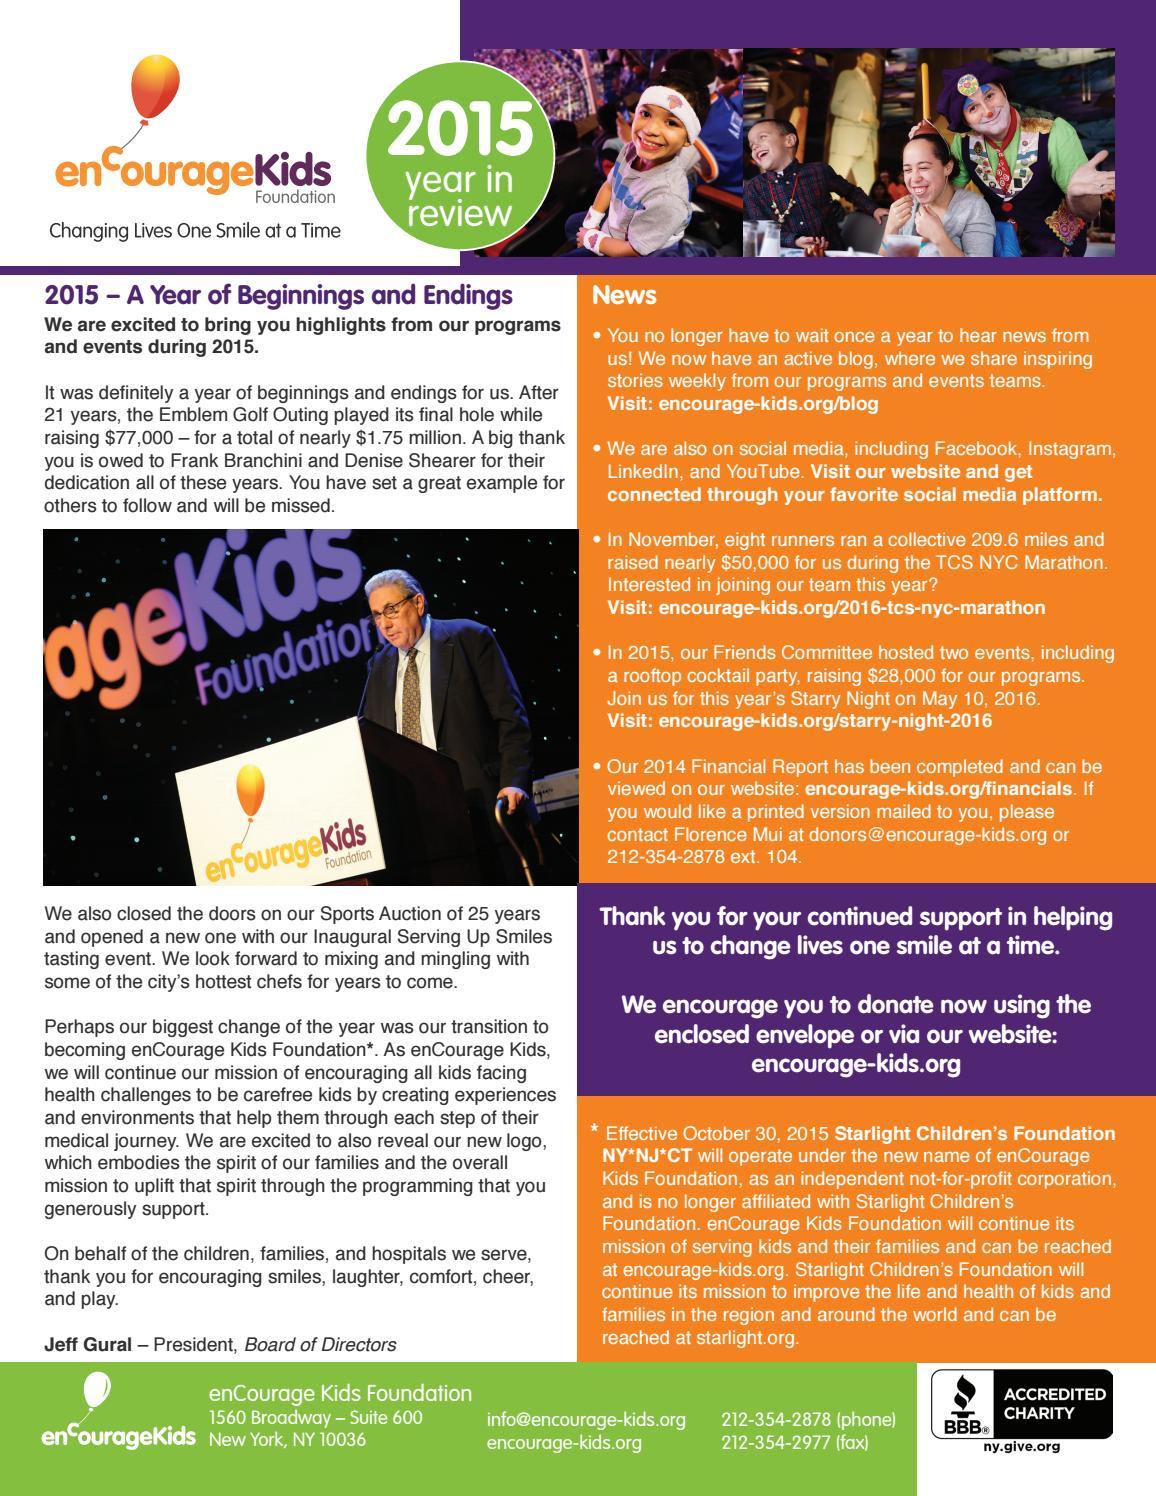 enCourage Kids' 2015 Newsletter by encourage-kids - issuu